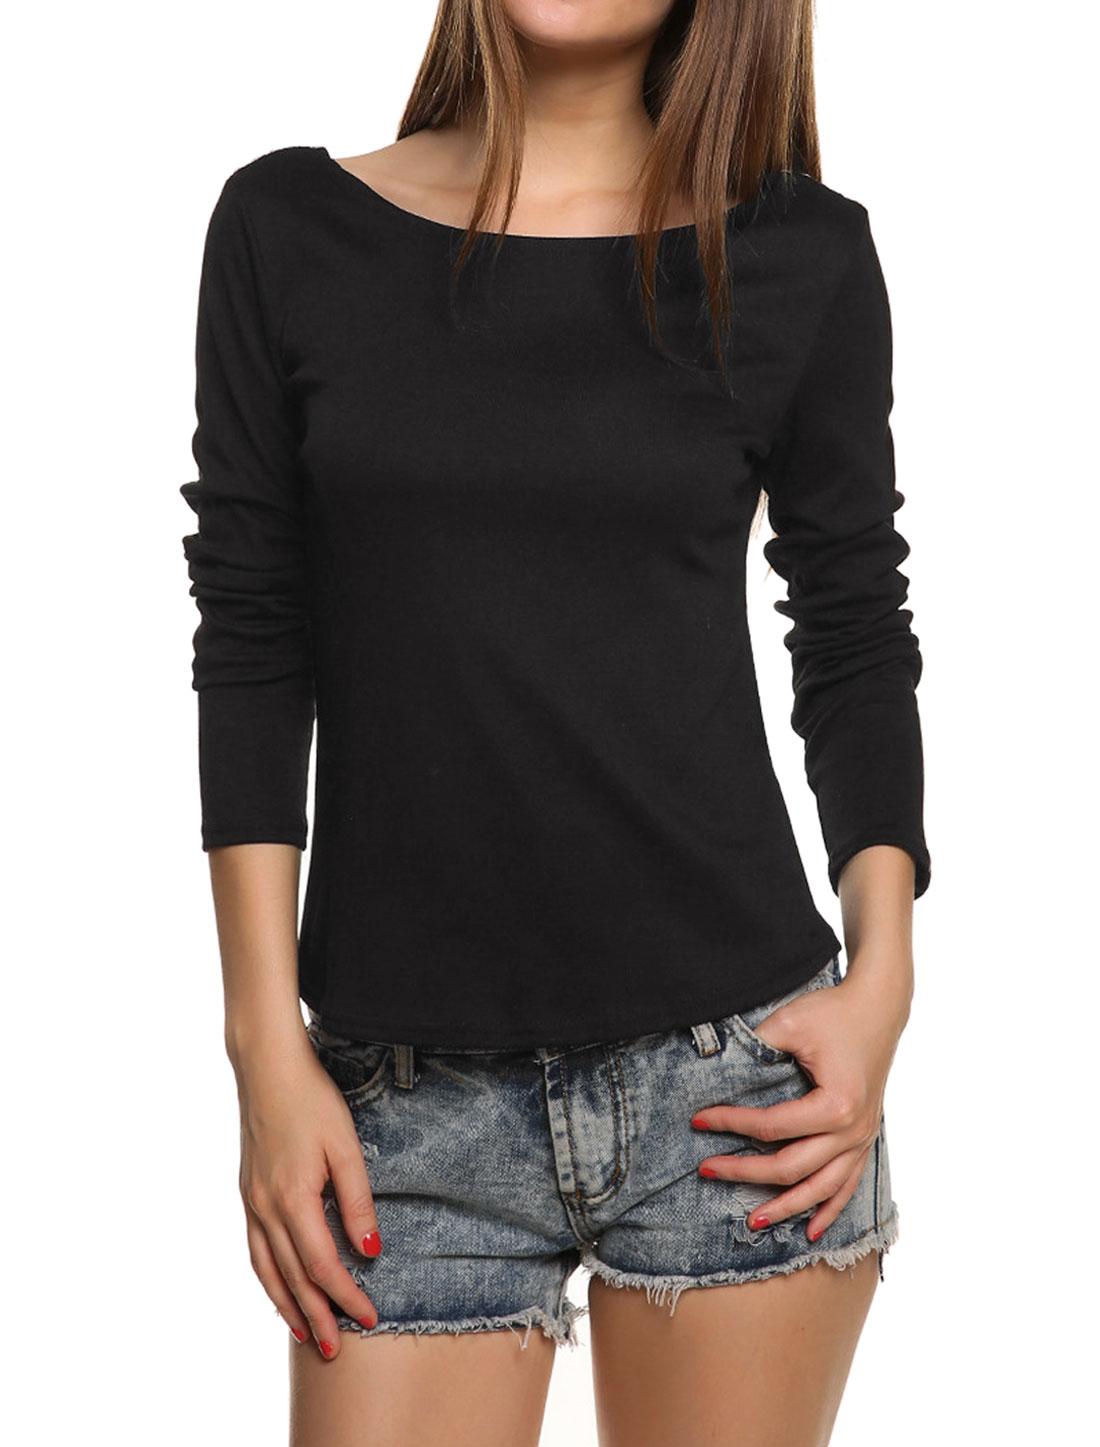 Women Crochet Panel Backless Slim Fit Top Black S